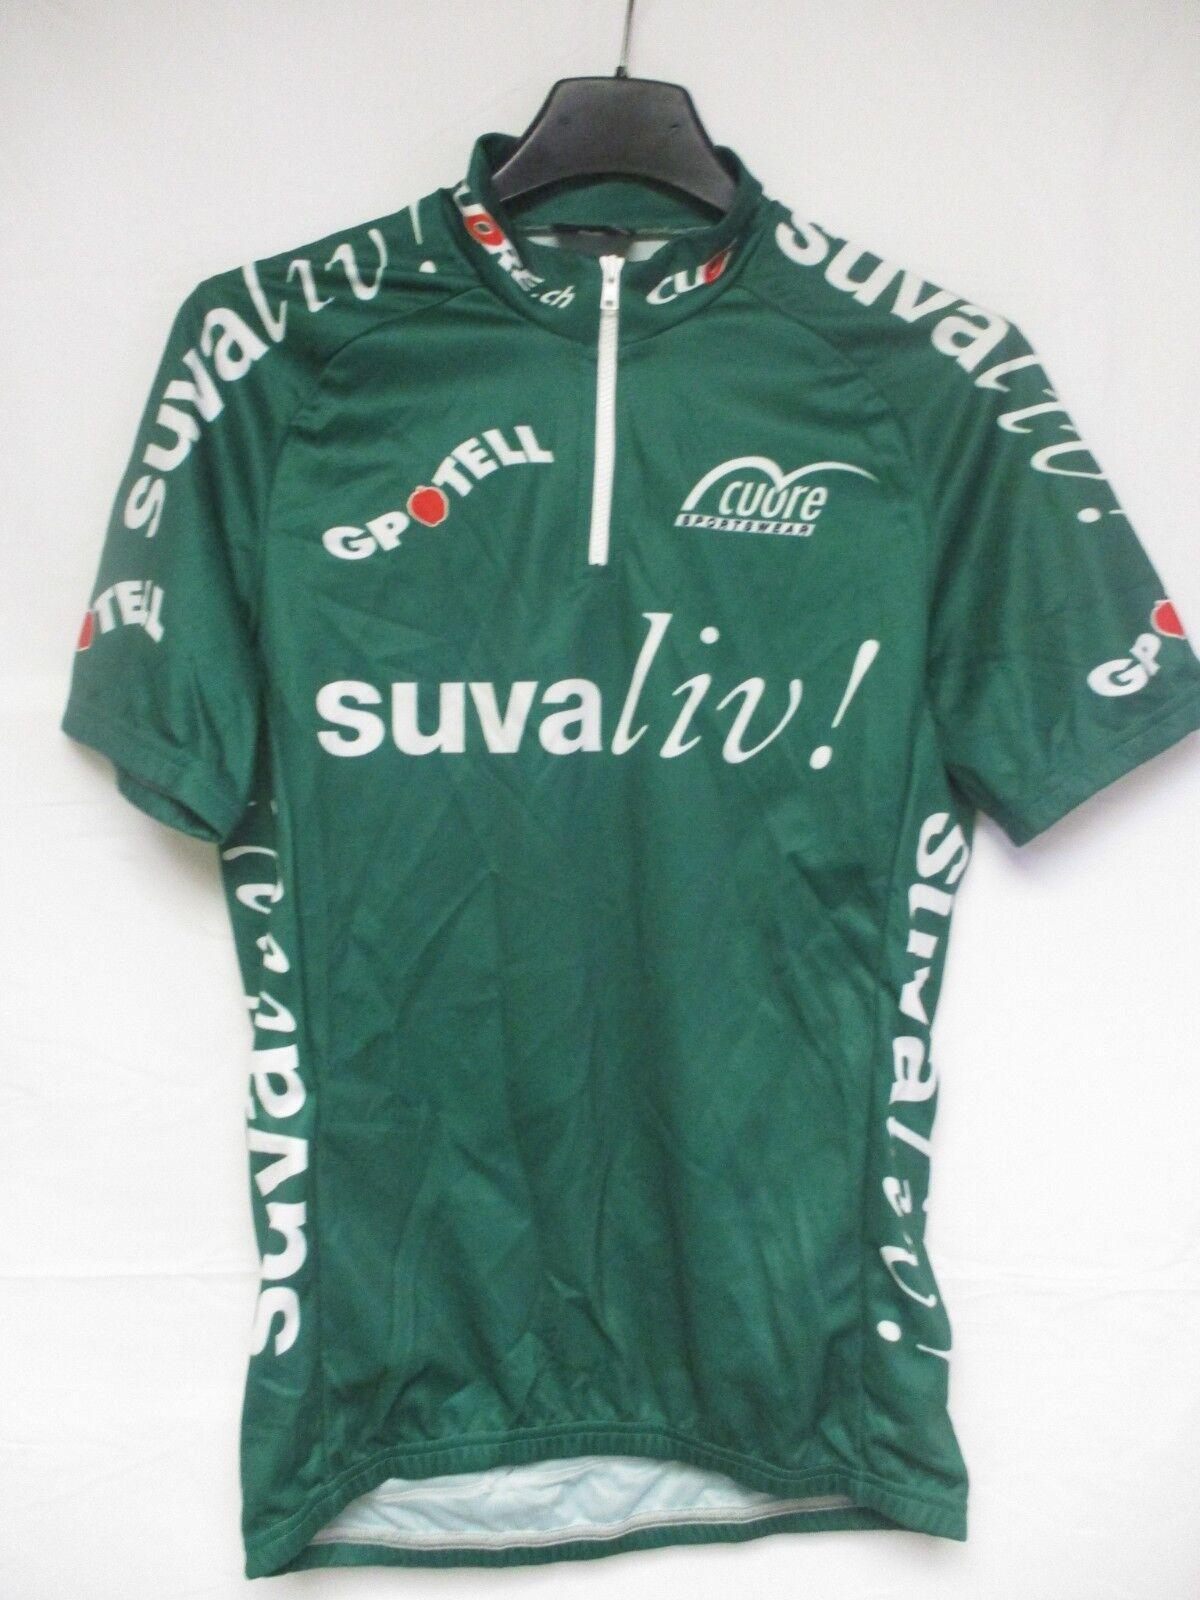 Maillot cycliste SUVALIV SICHERE FREIZEIT n°66 shirt trikot maglia Cuore n°66 S